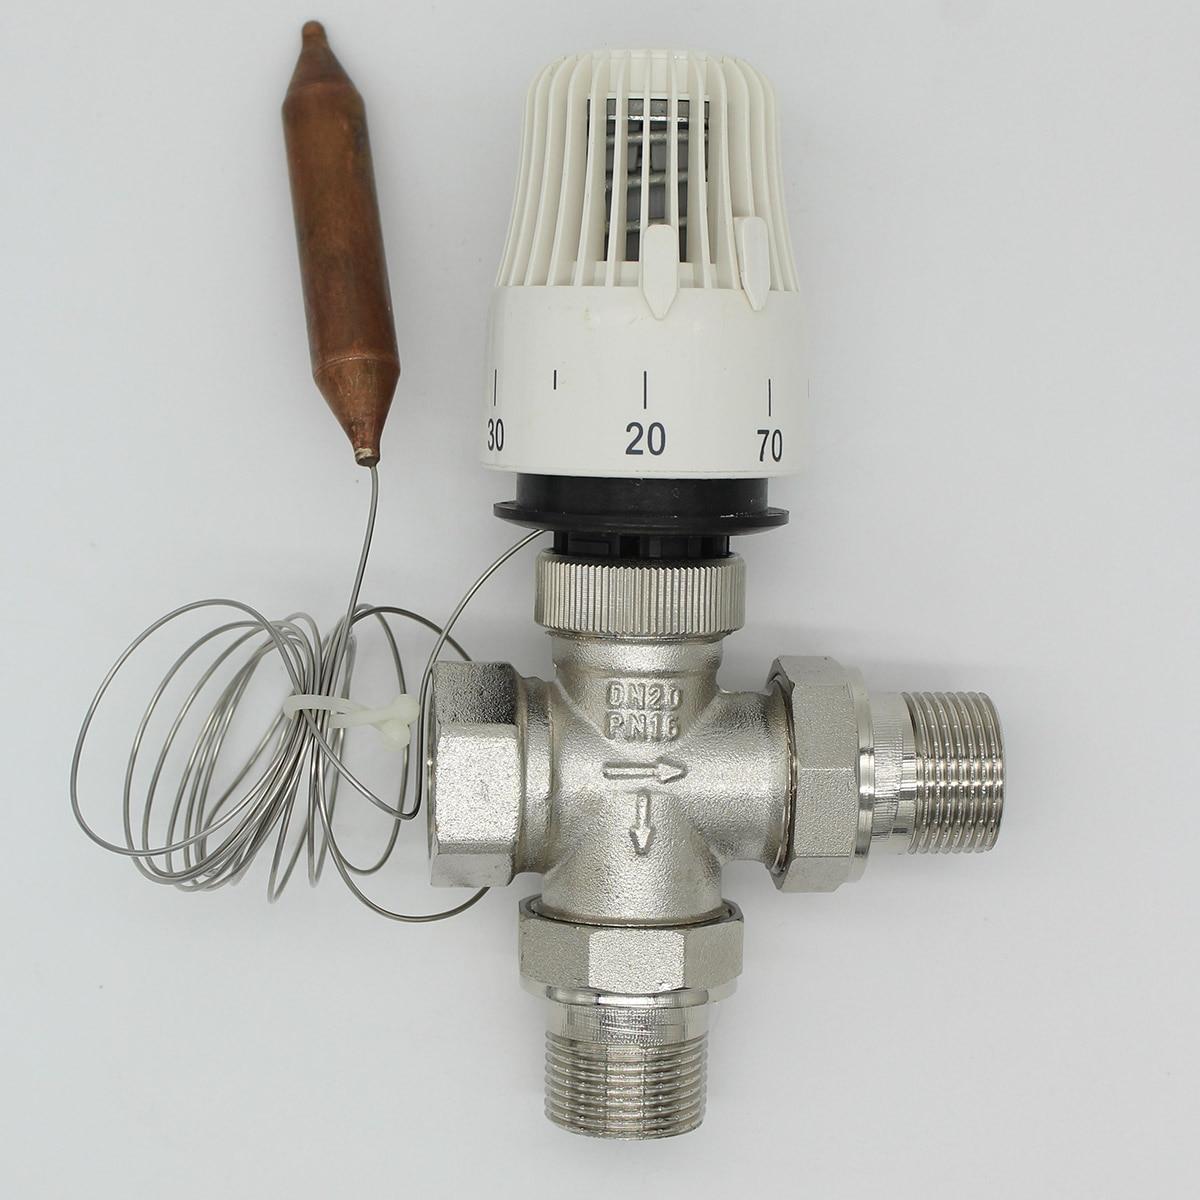 Energy Saving 30-70 Degree Control Floor Heating System Thermostatic Radiator Valve  M30*1.5 Remote Controller Three Way Valve